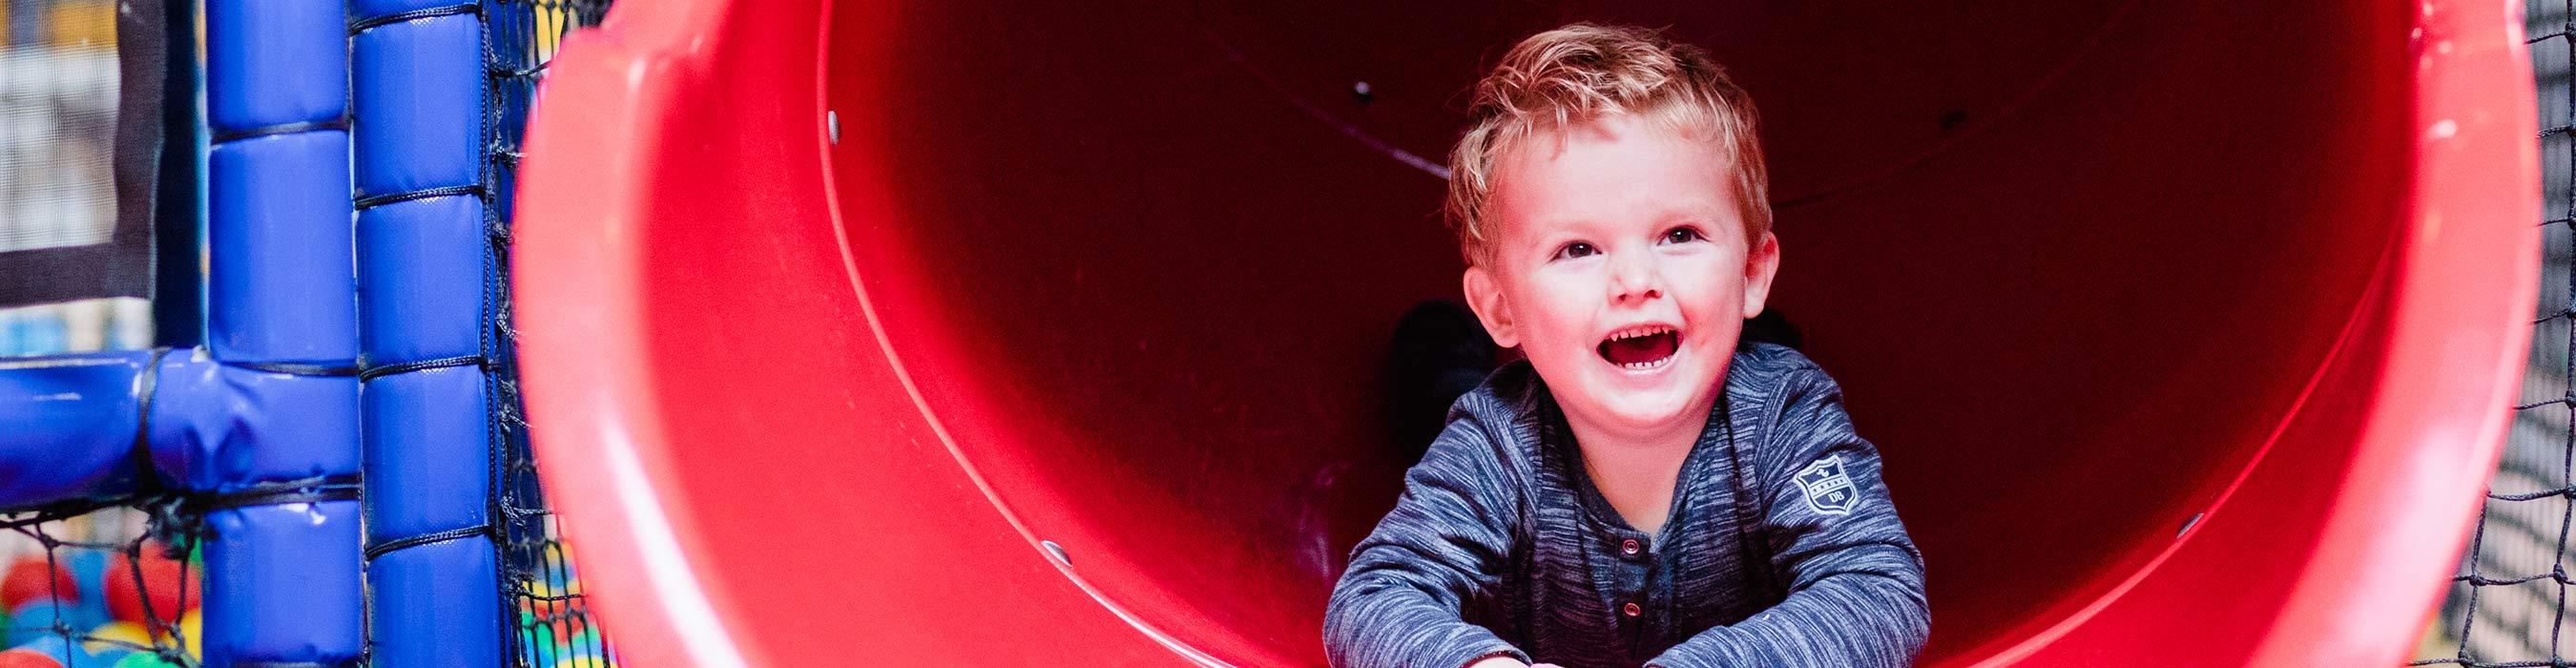 Afbeelding 1 - Kids Castle - Kinderspeelparadijs